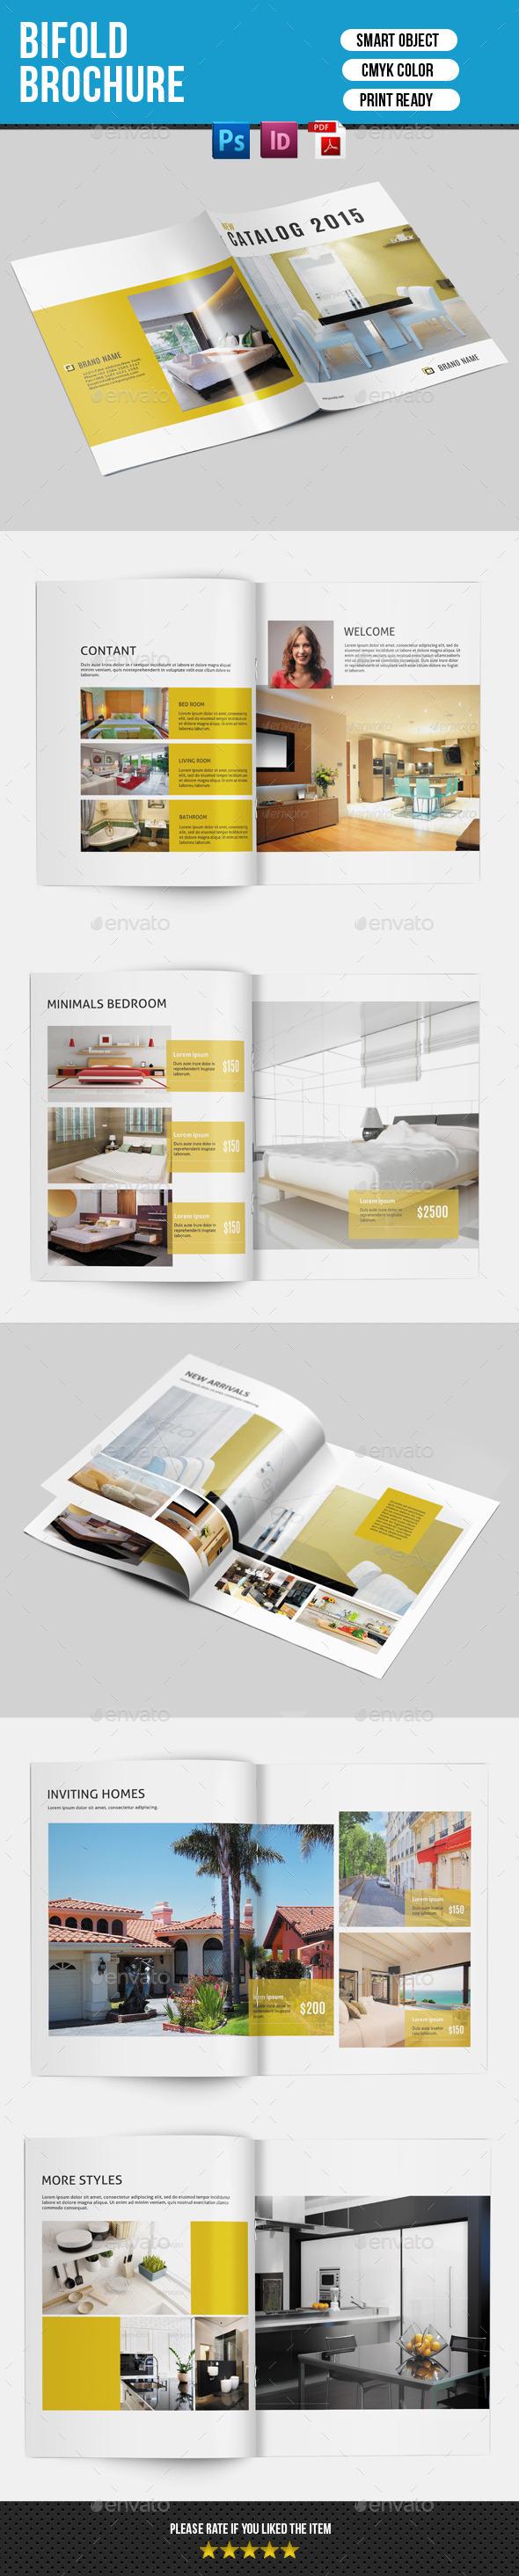 Bifold Brochure for Interior Design-V141 - Corporate Brochures